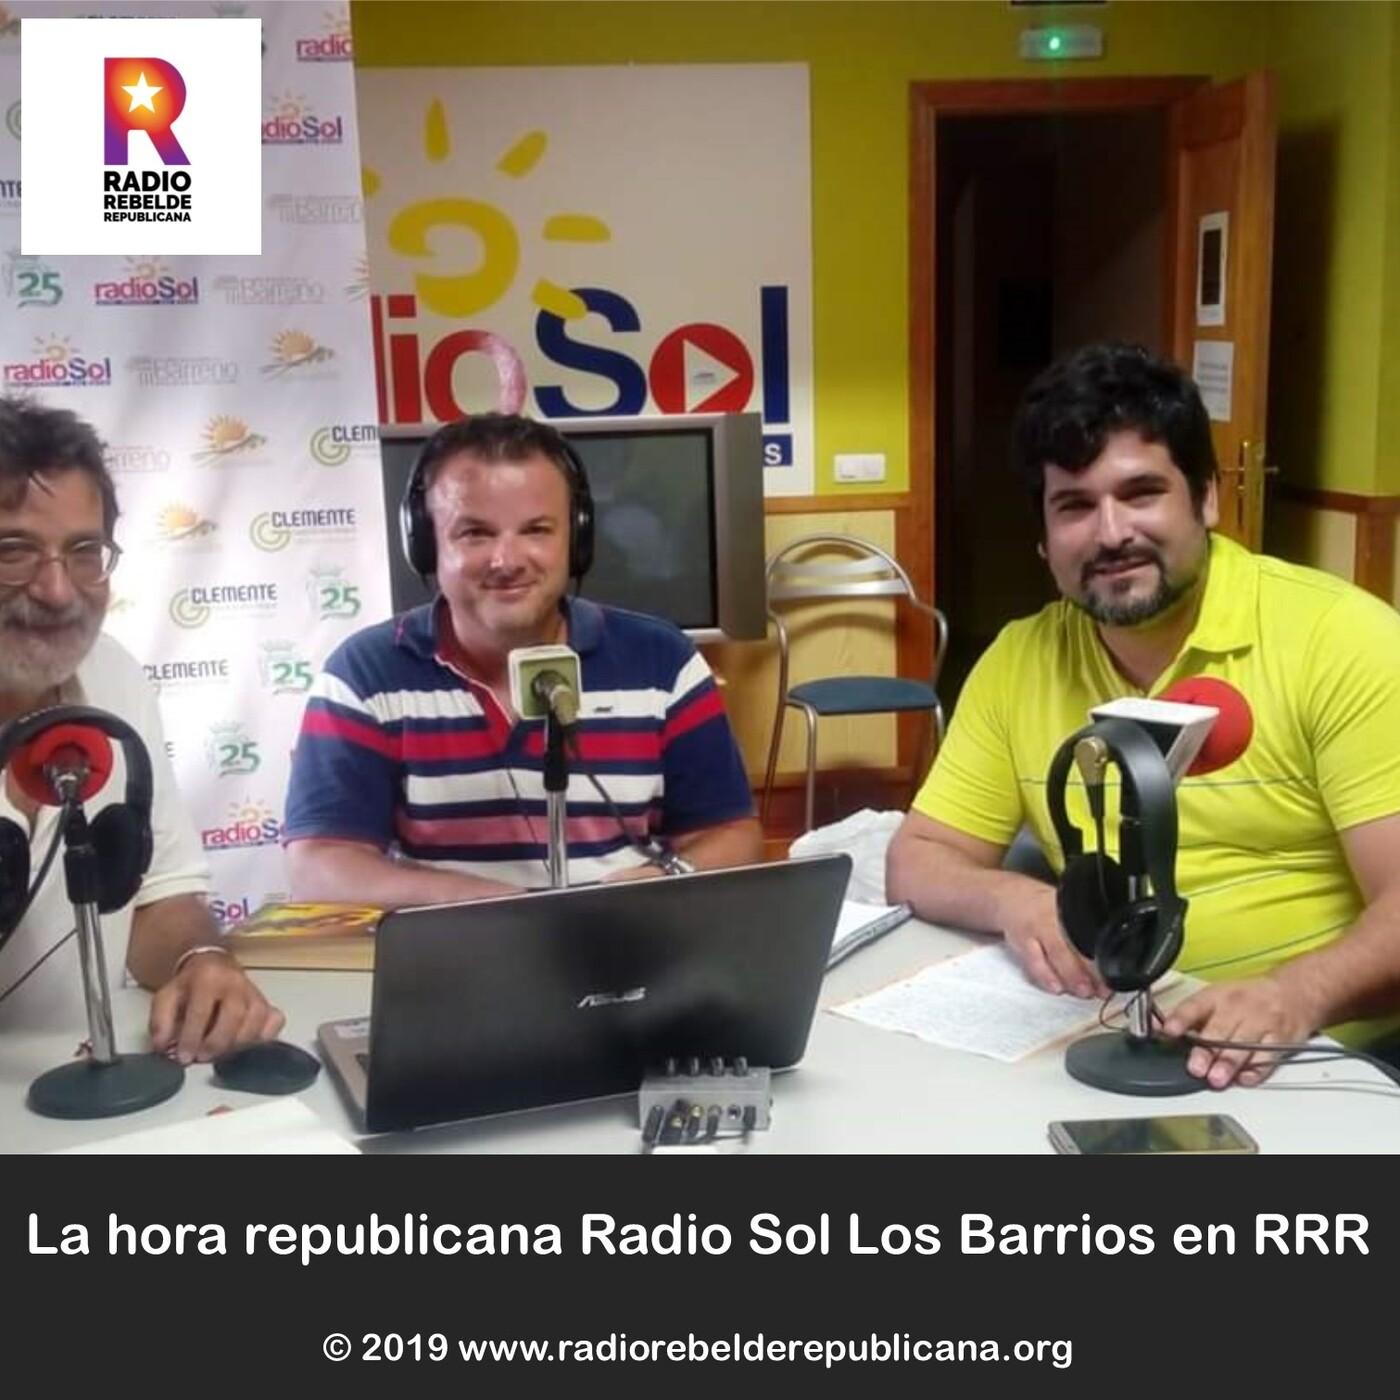 La hora republicana Radio Sol en RRR 09.10.2020